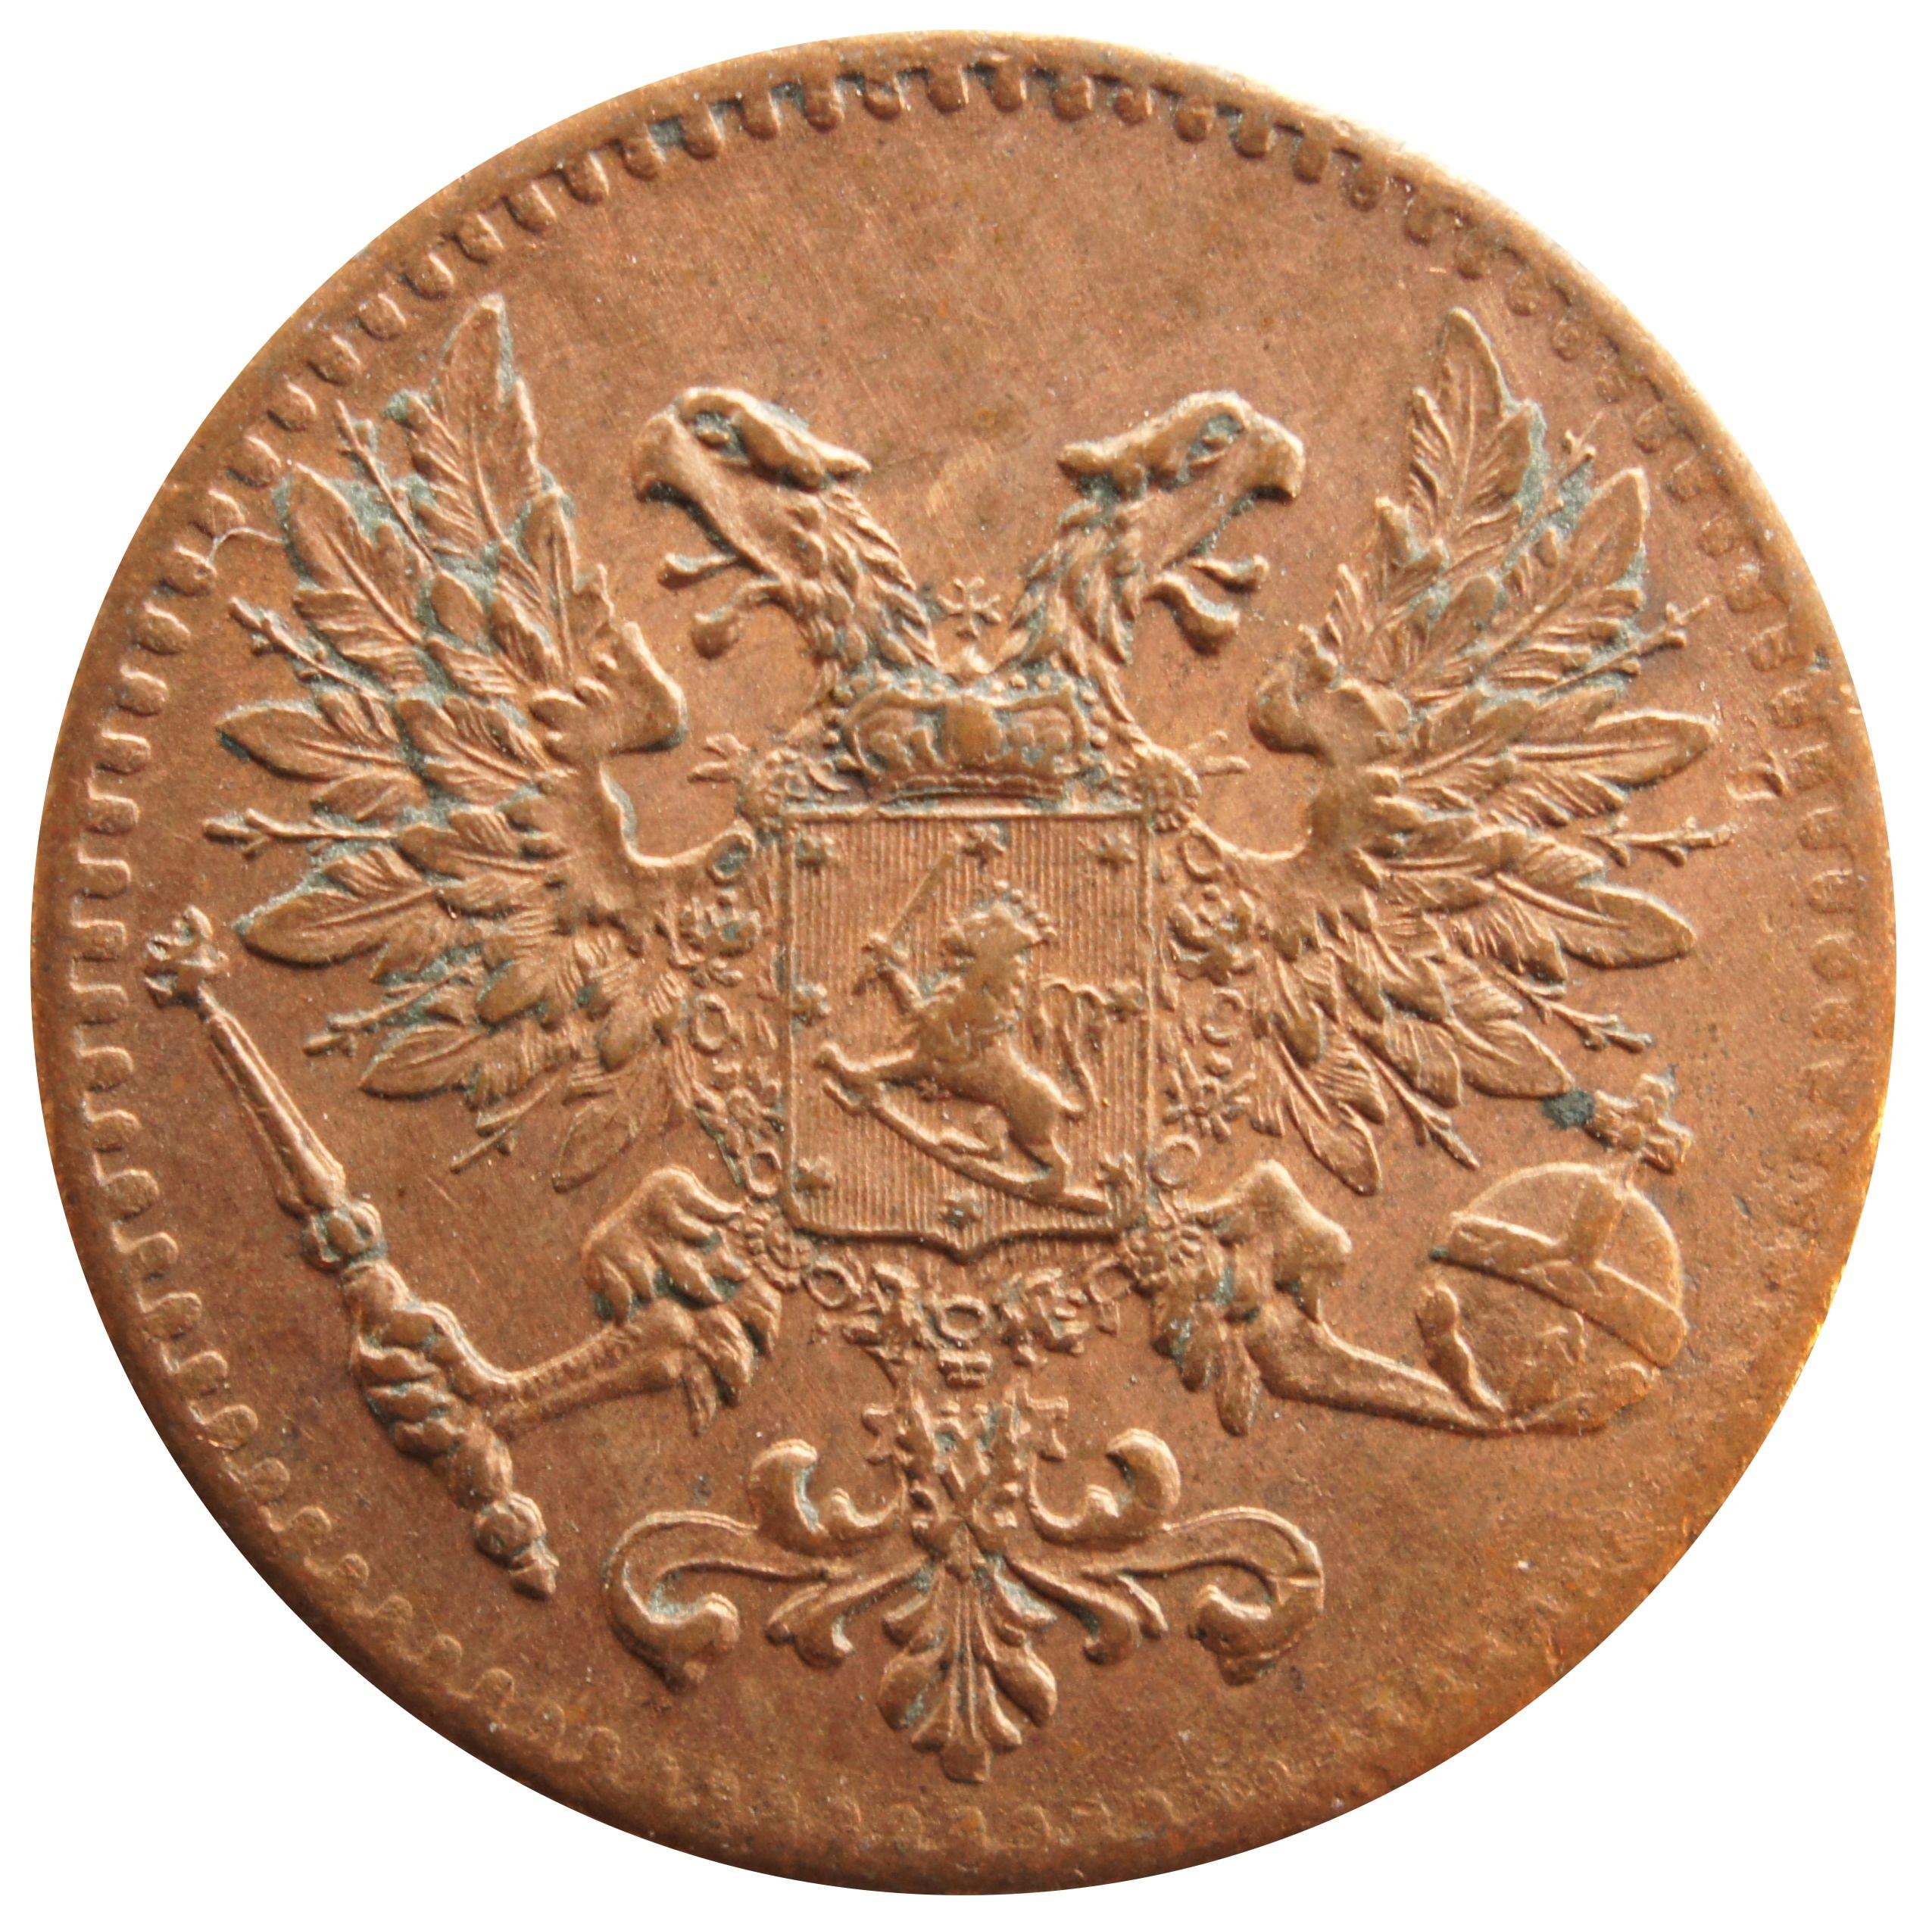 Finland 1 Penni (1917 Nikolai II Civil War Coinage)